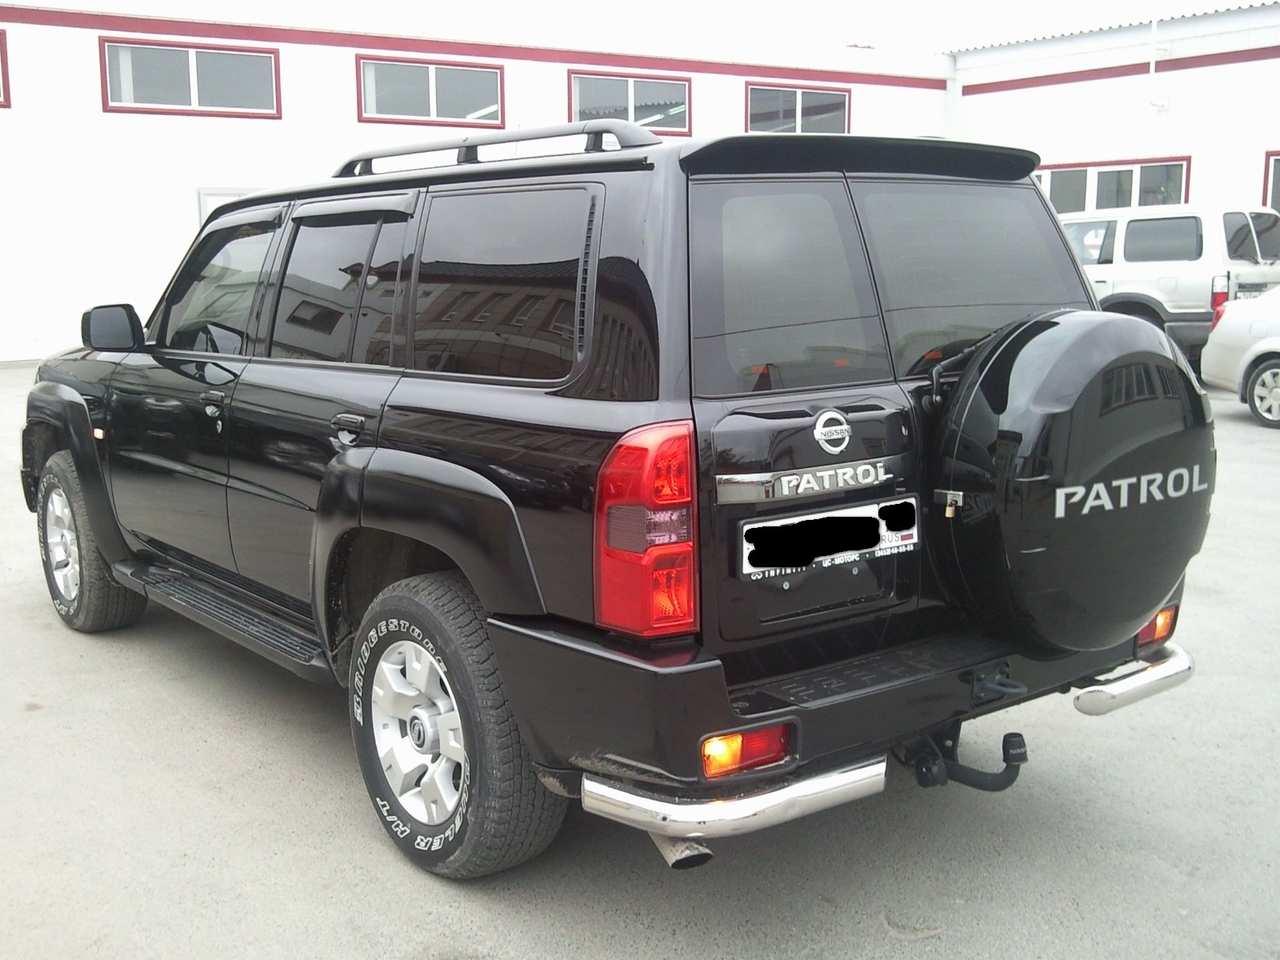 2007 nissan patrol for sale 3000cc diesel automatic for sale. Black Bedroom Furniture Sets. Home Design Ideas